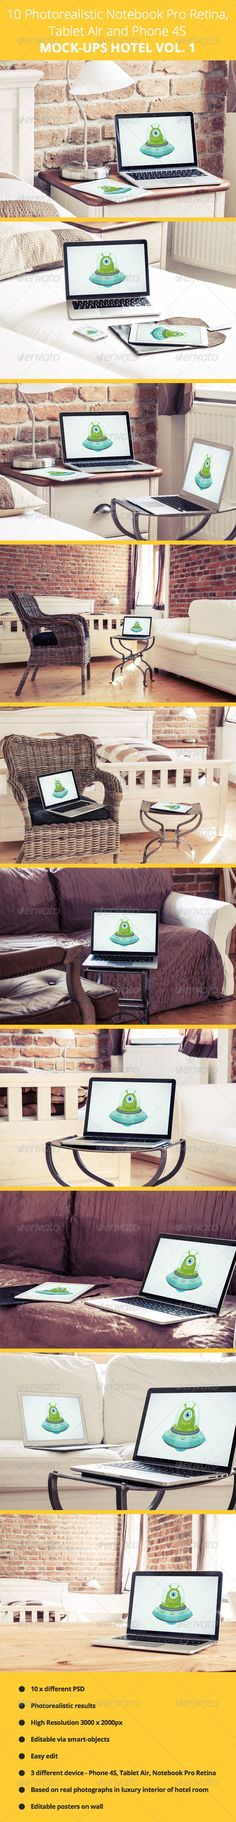 10 Photorealistic Device Mock-Ups in Hotel - Vol.1 - Displays Product Mock-Ups